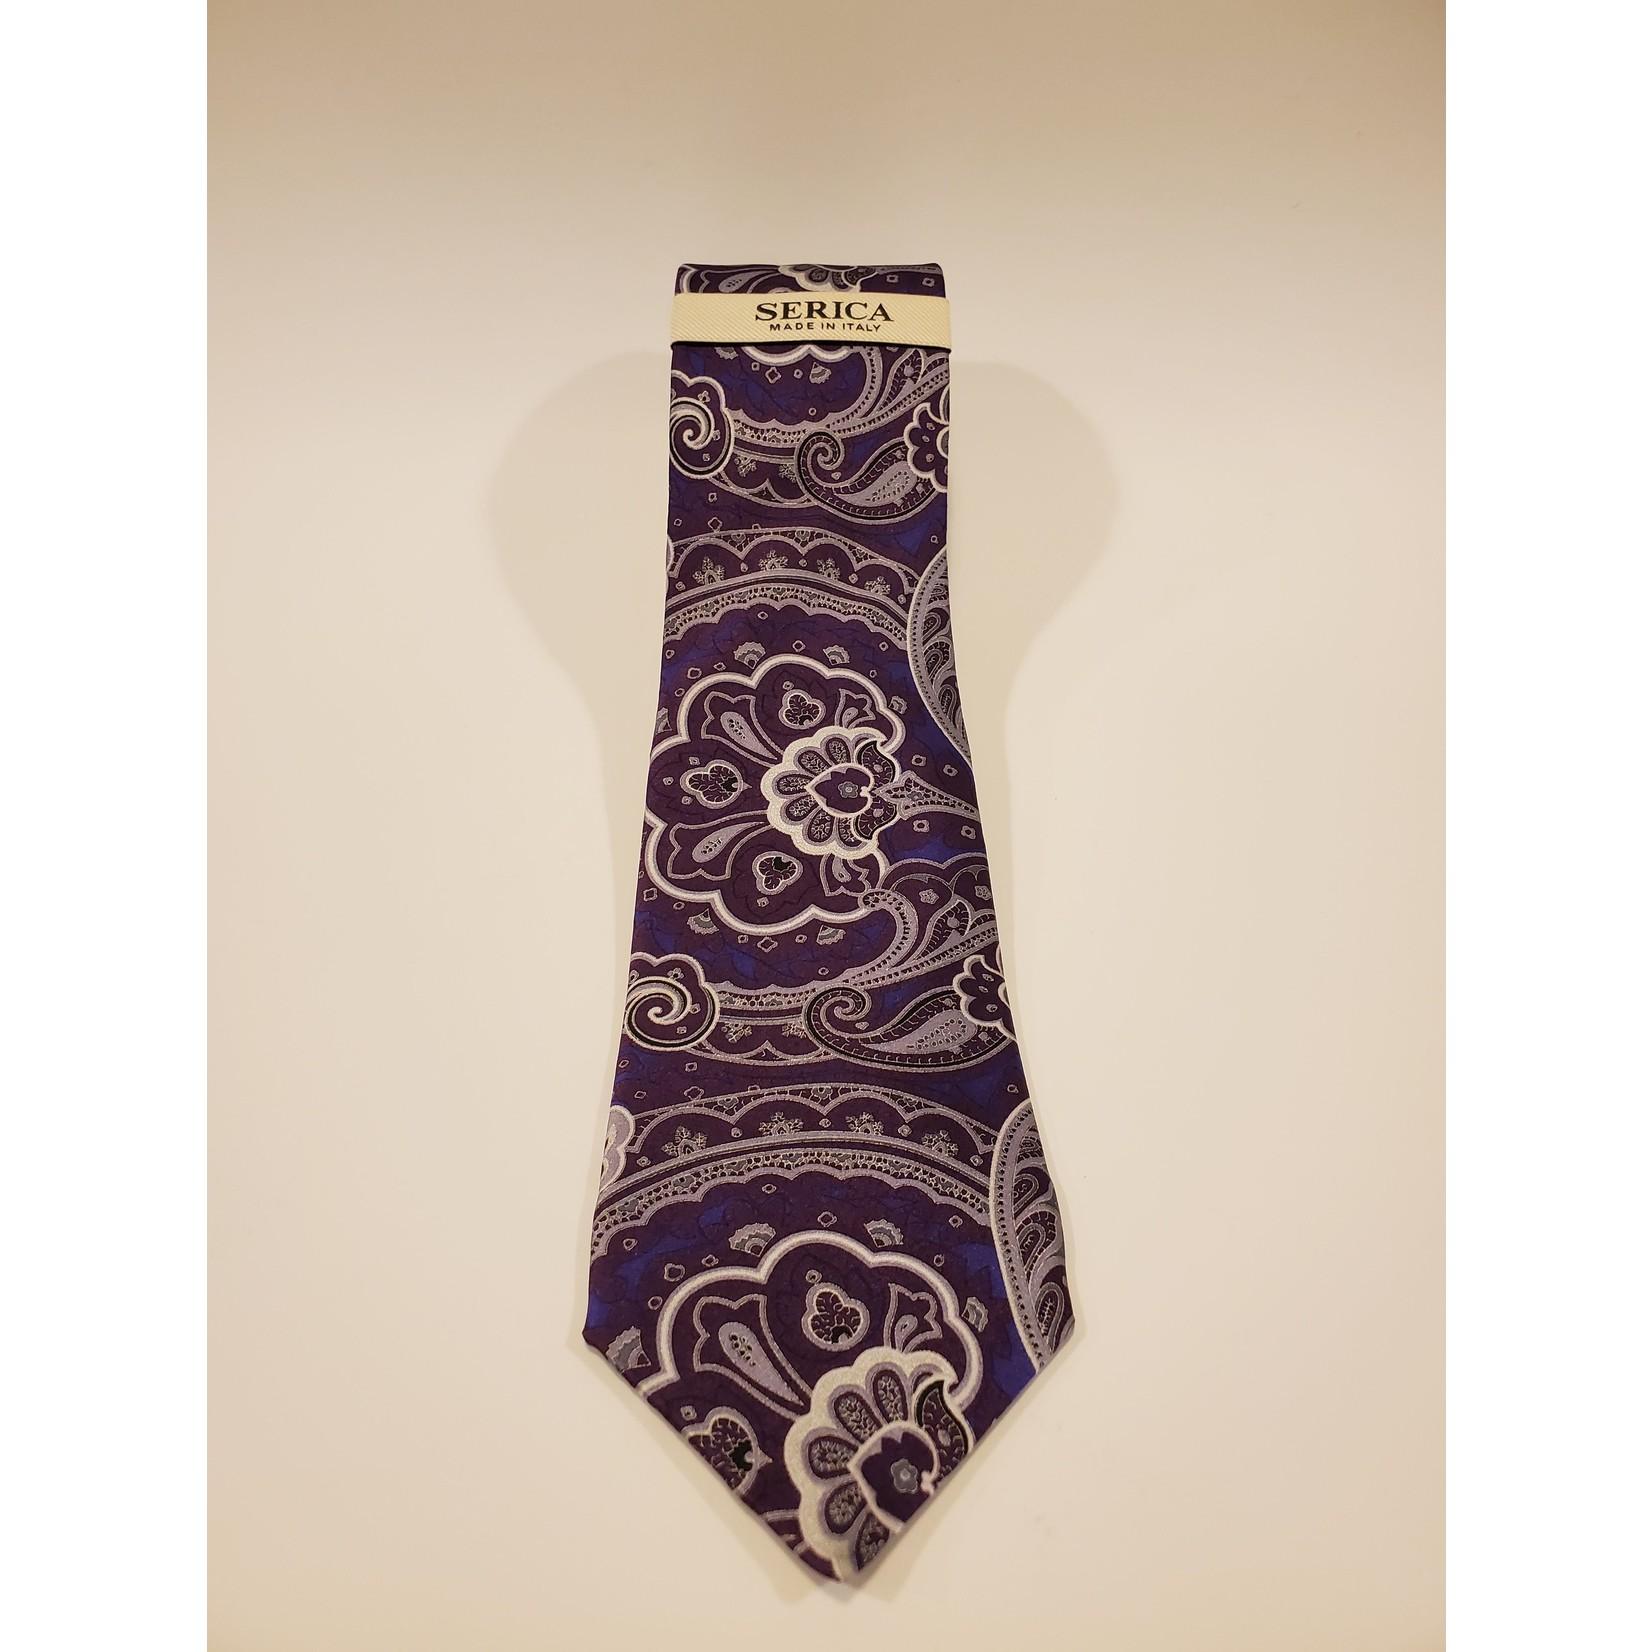 Serica 213213 Printed Oversized Pattern Tie